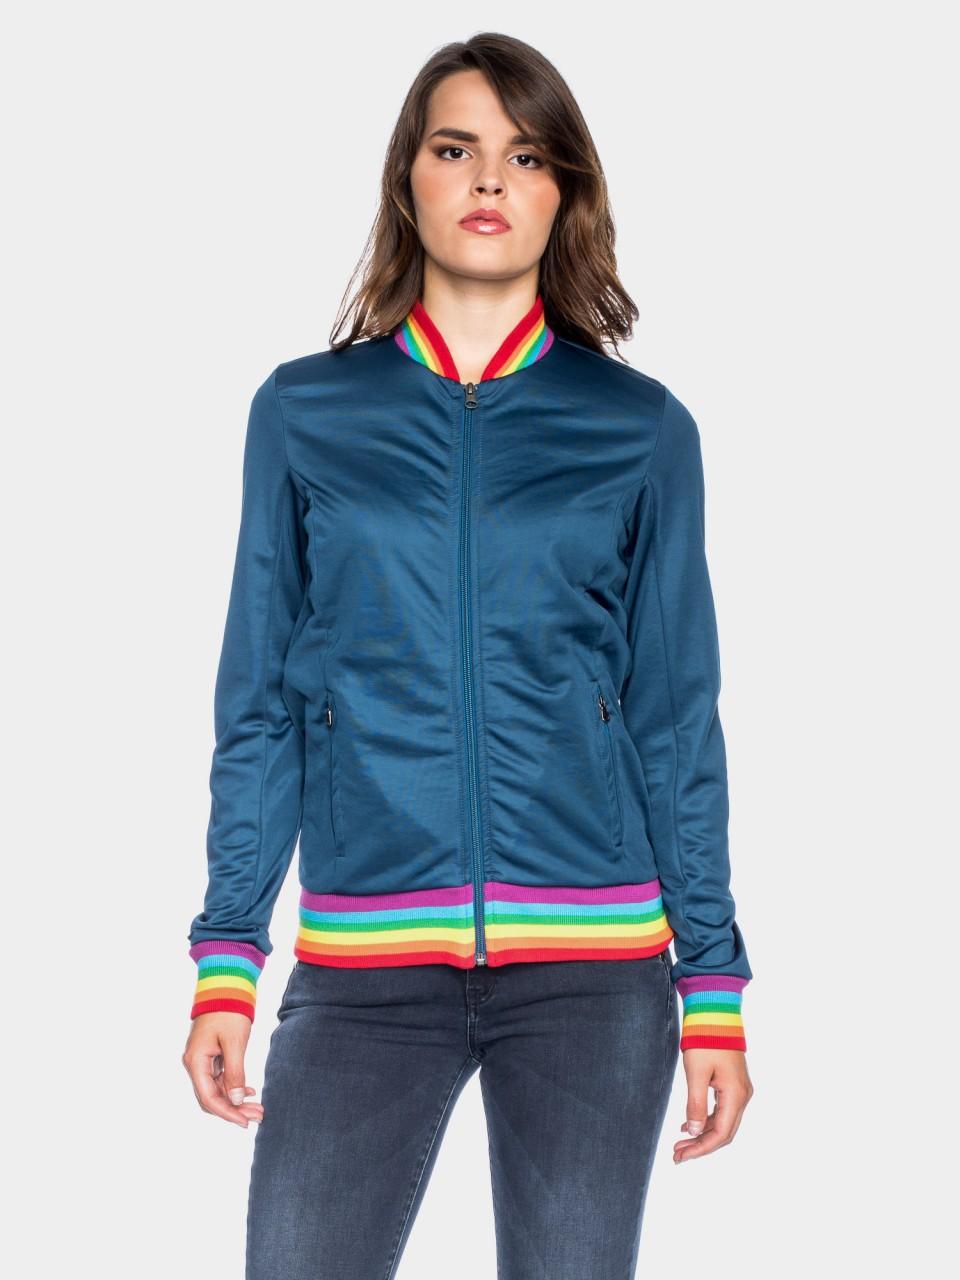 sportliche damen jacke in dunkelblau mit regenbogendetails. Black Bedroom Furniture Sets. Home Design Ideas